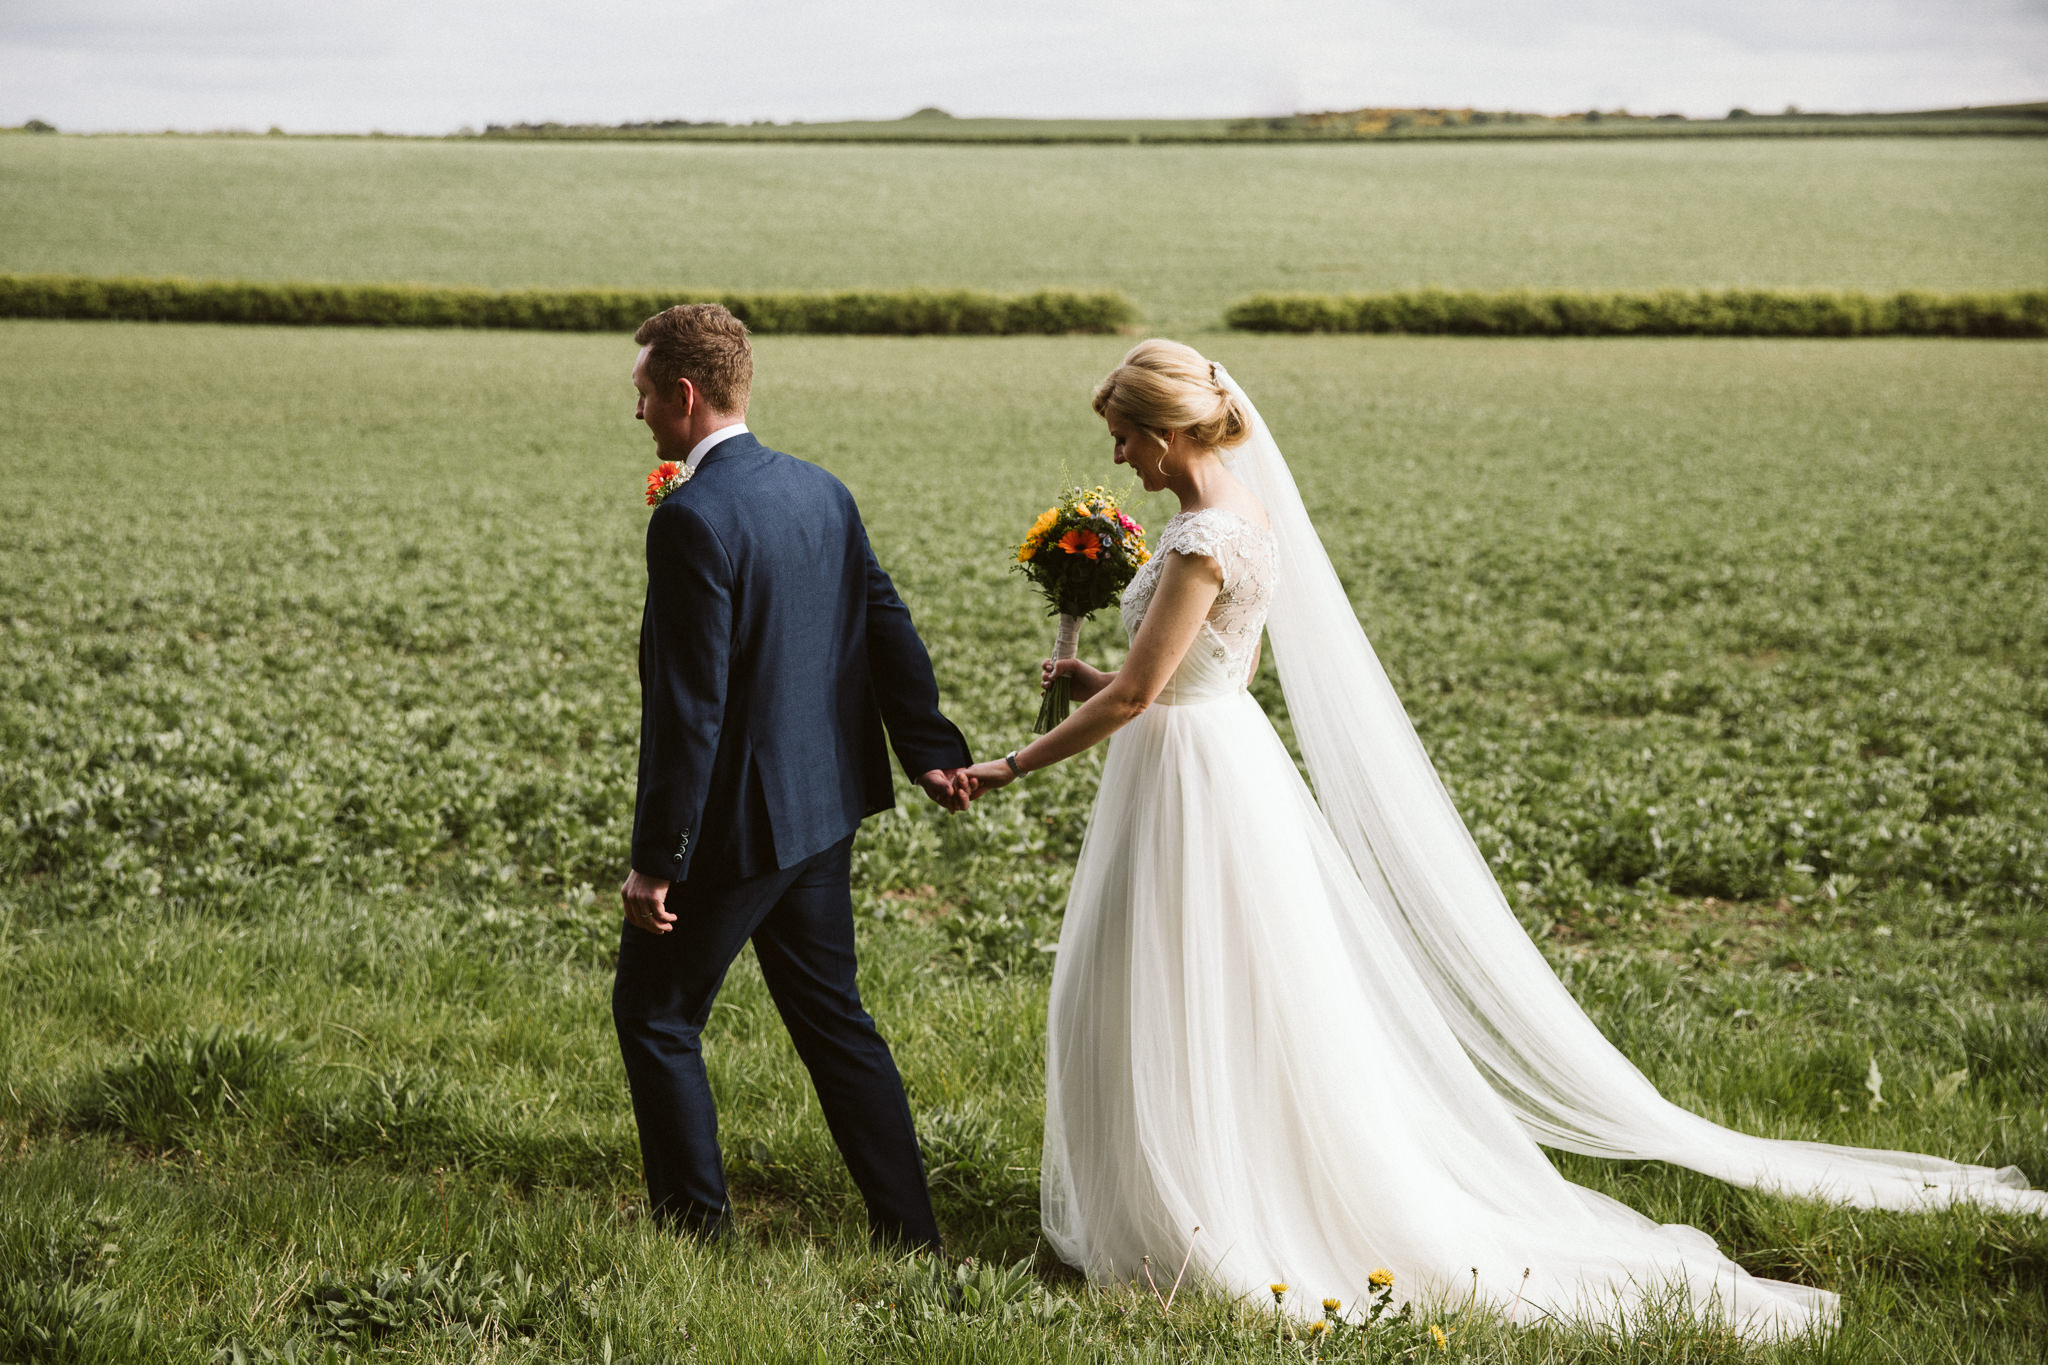 northside-farm-wedding-northumberland-margarita-hope (81).jpg